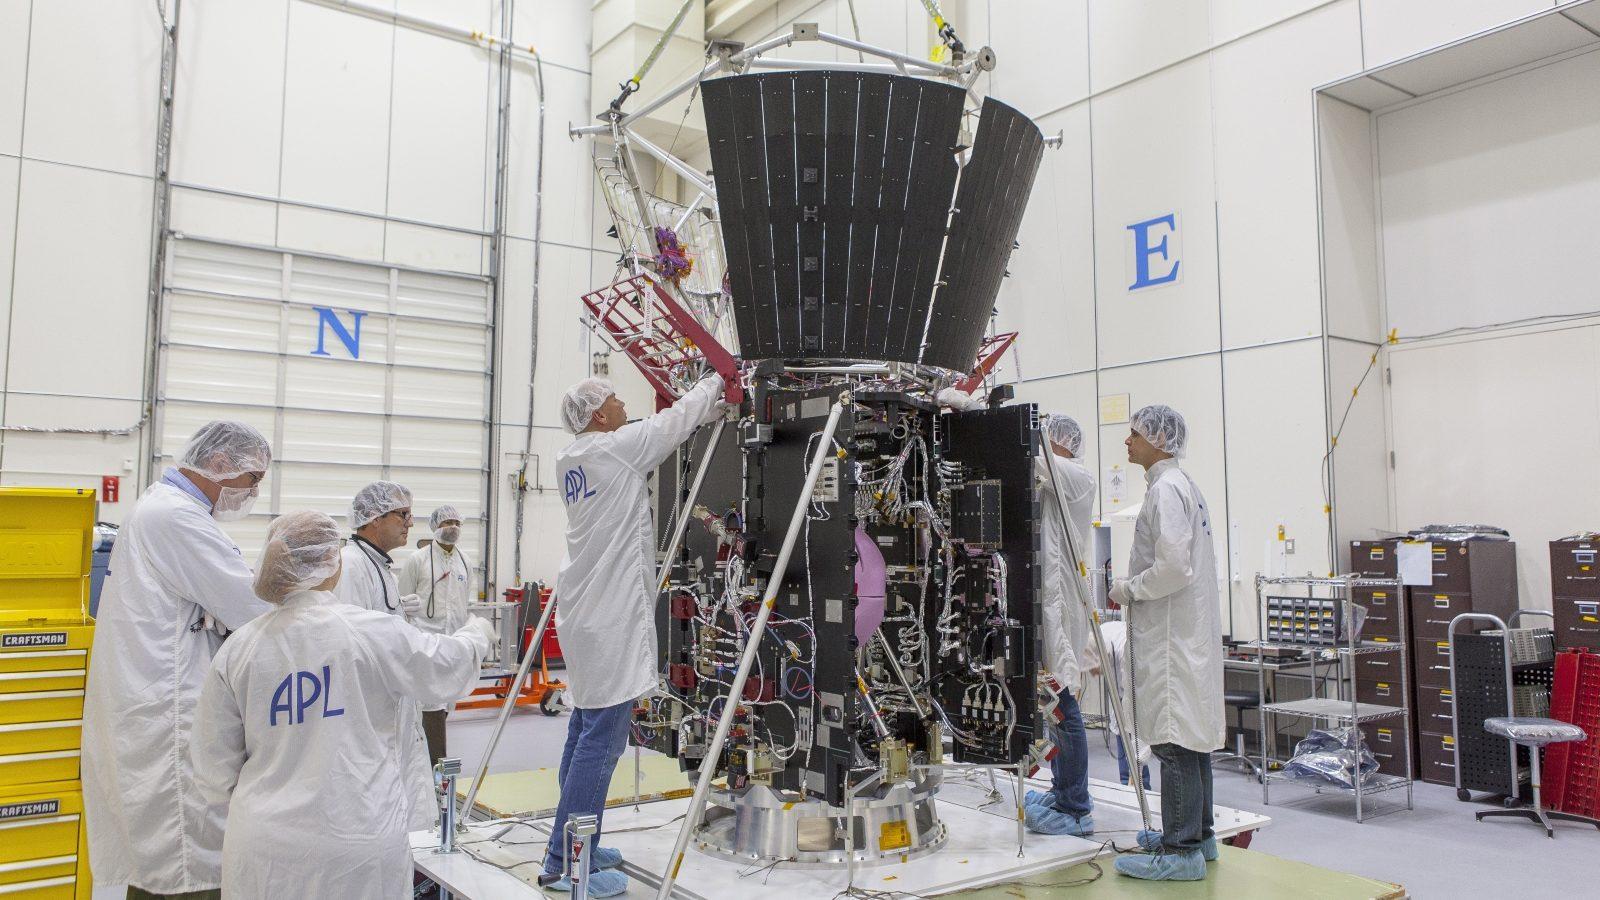 Parker Solar Probe at APL